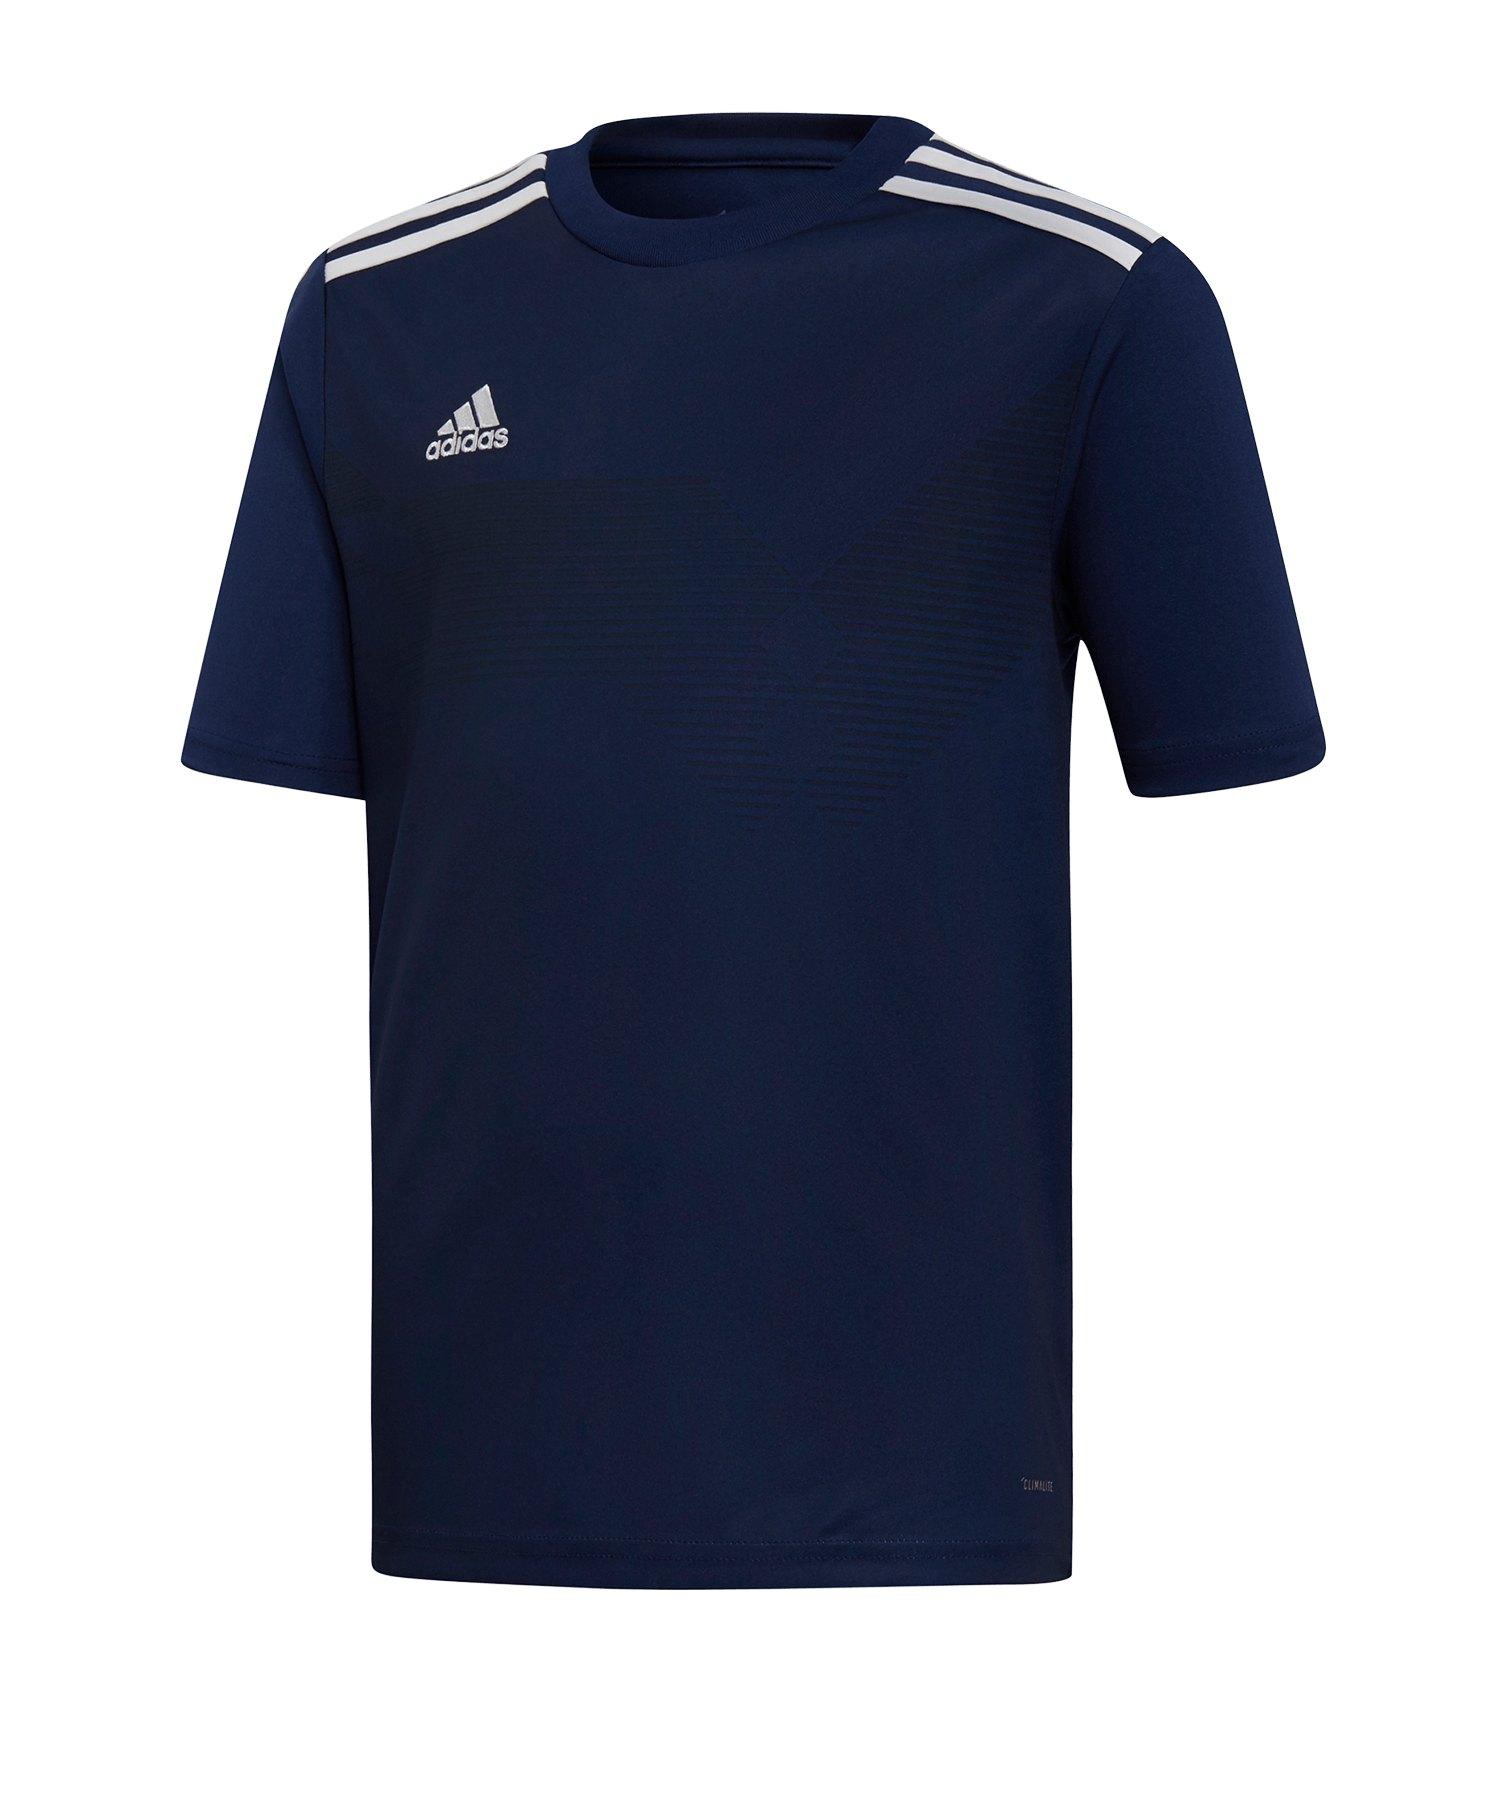 adidas Campeon 19 Trikot kurzarm Kids Blau Weiss - blau